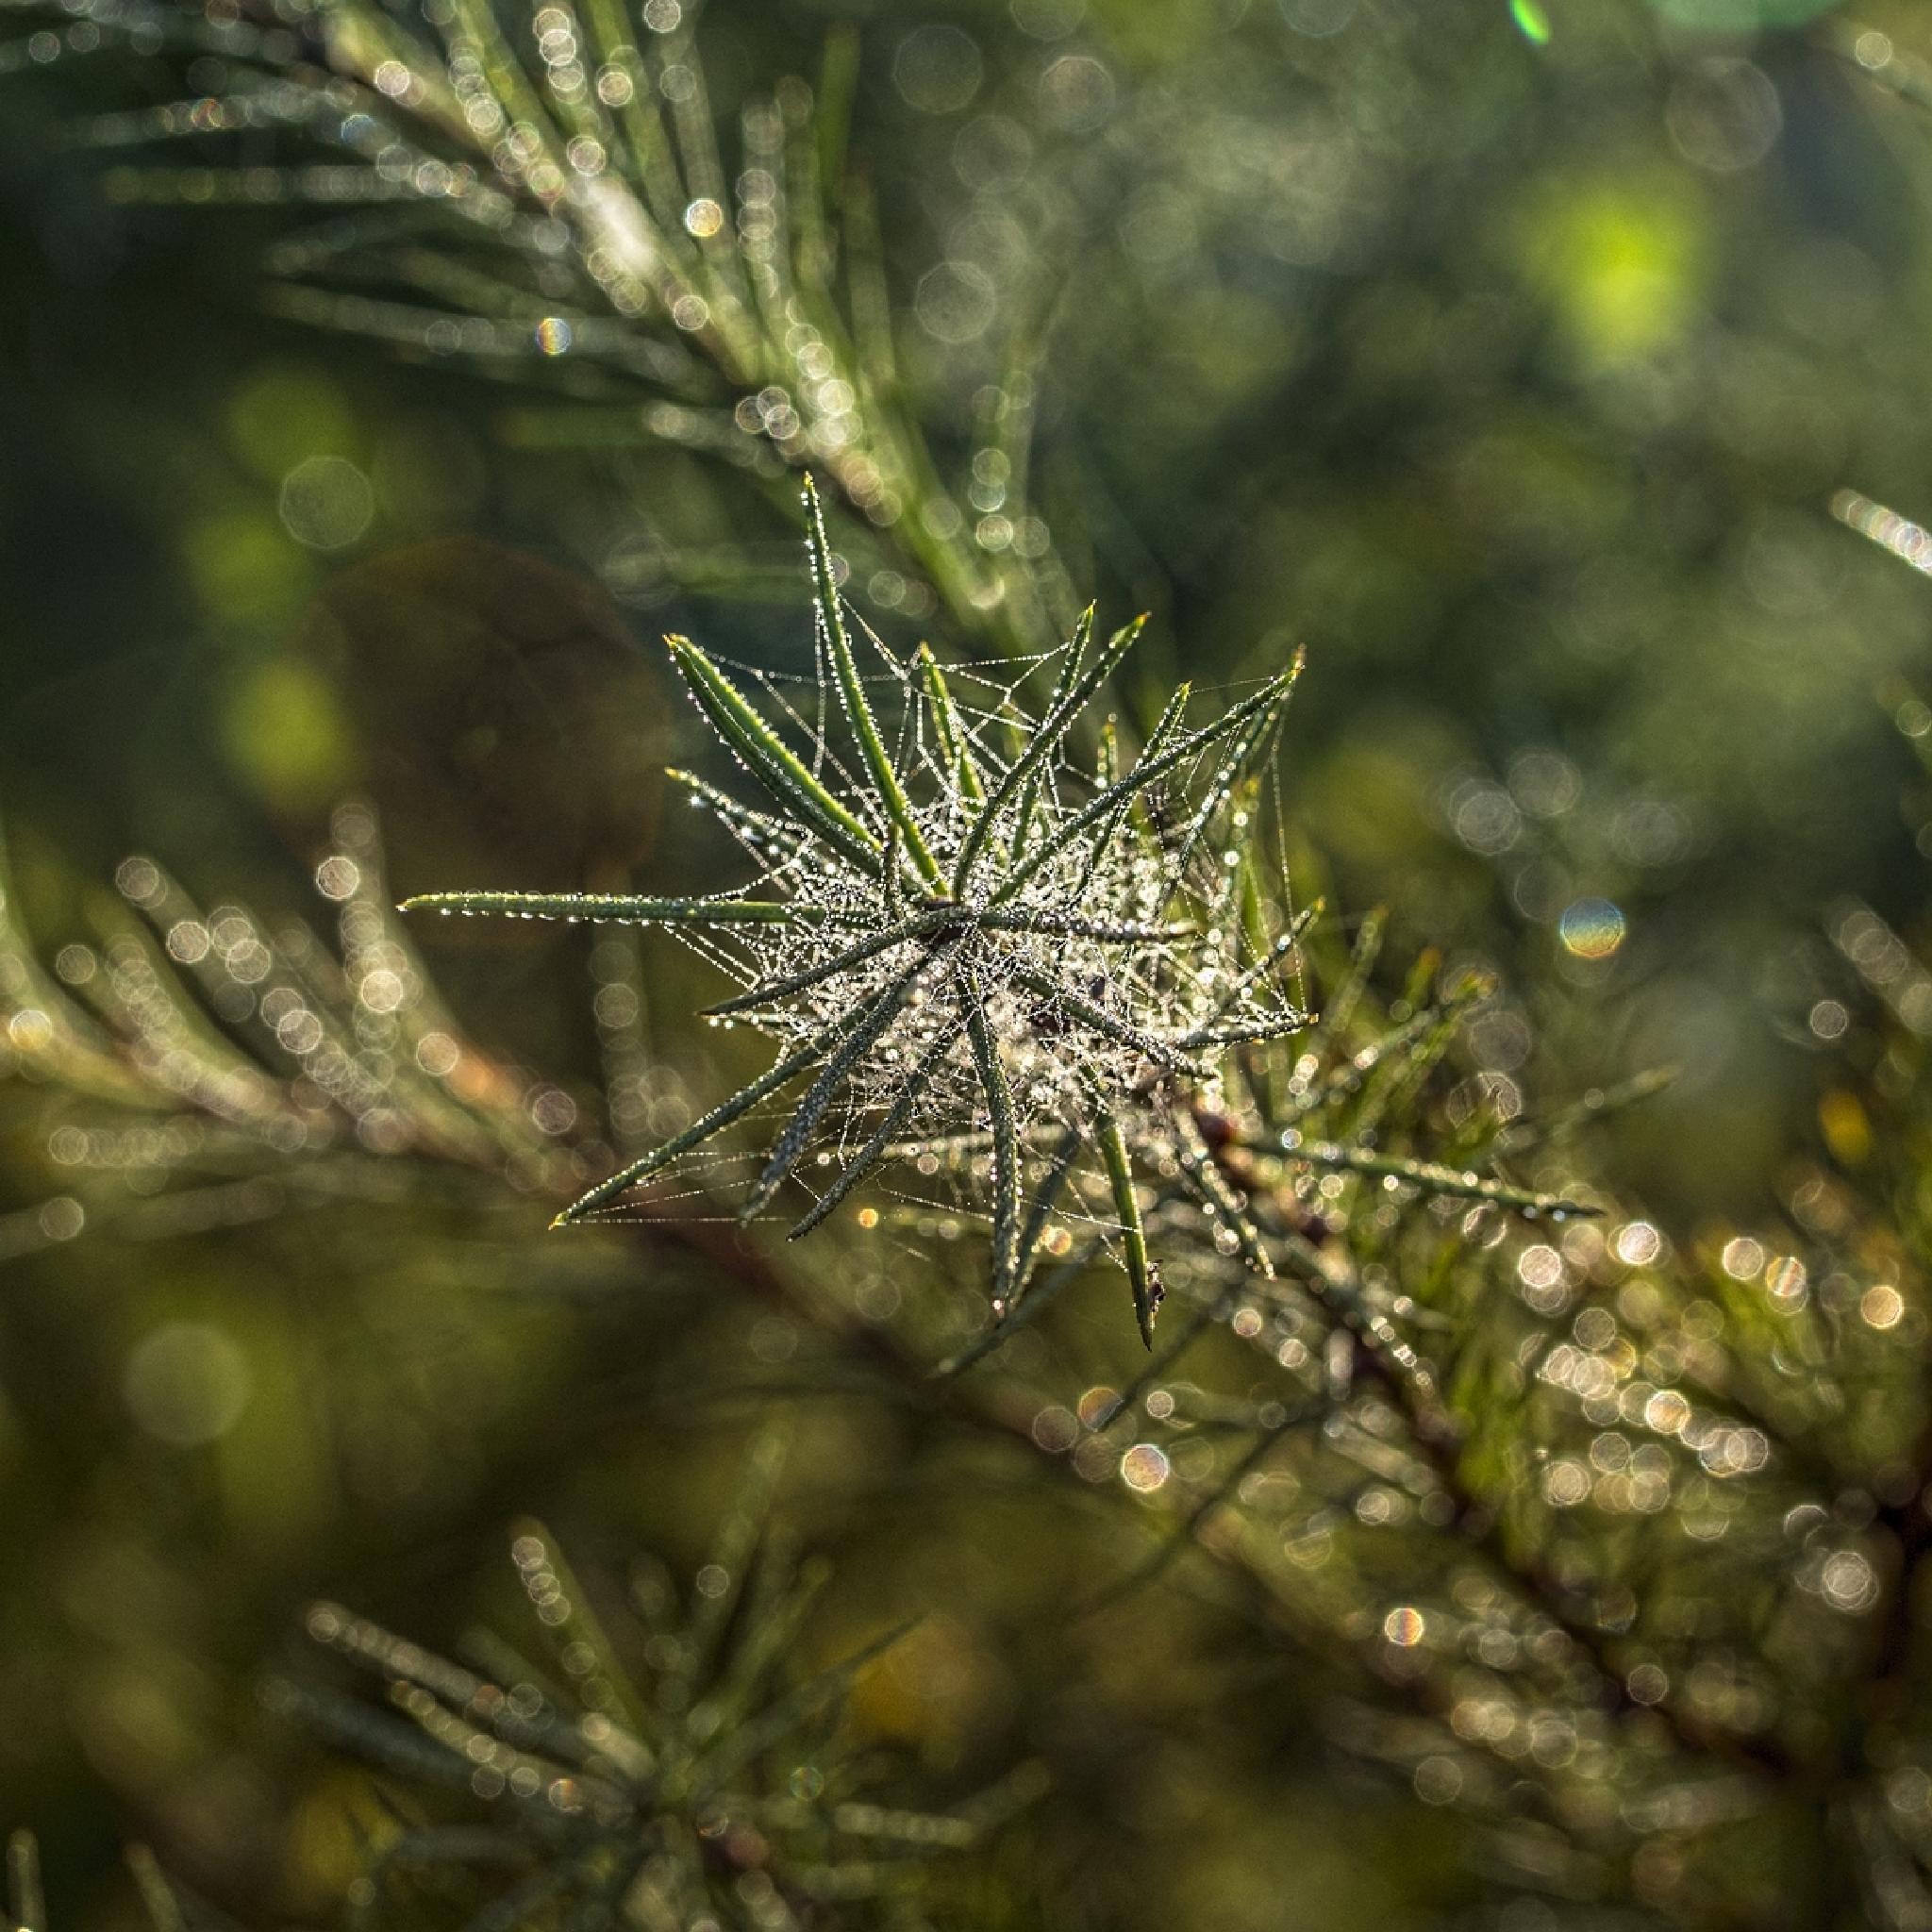 Nature by Waldemar Sadlowski